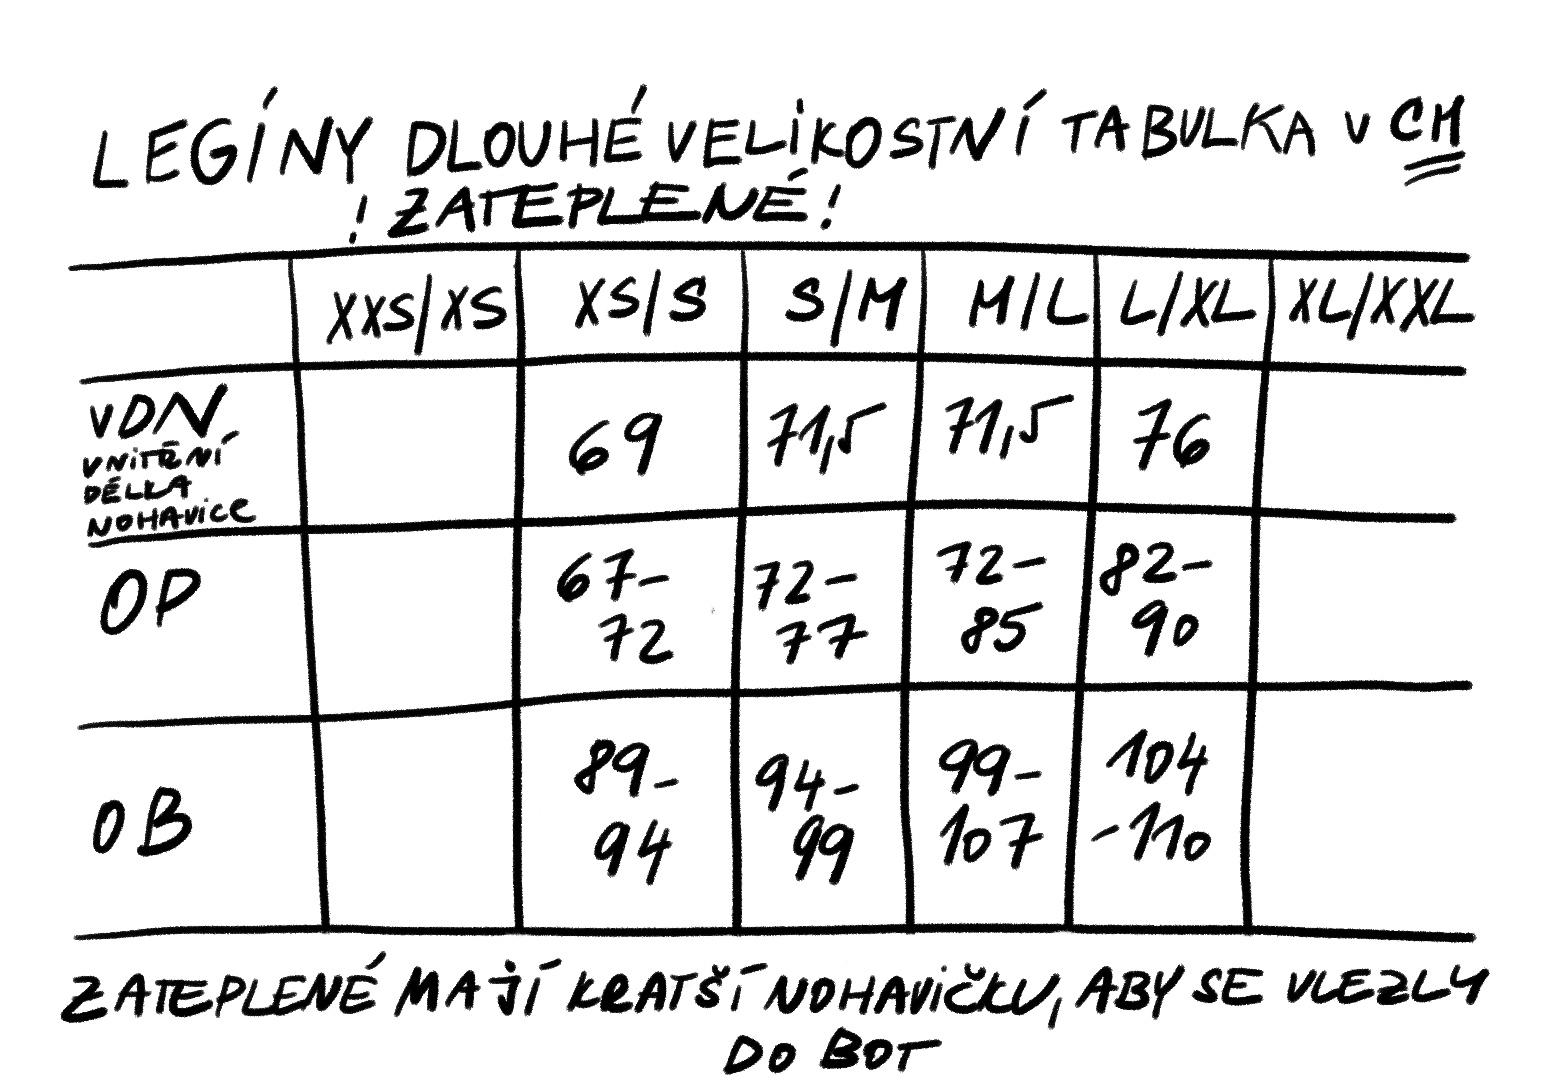 tabulka_zateplene